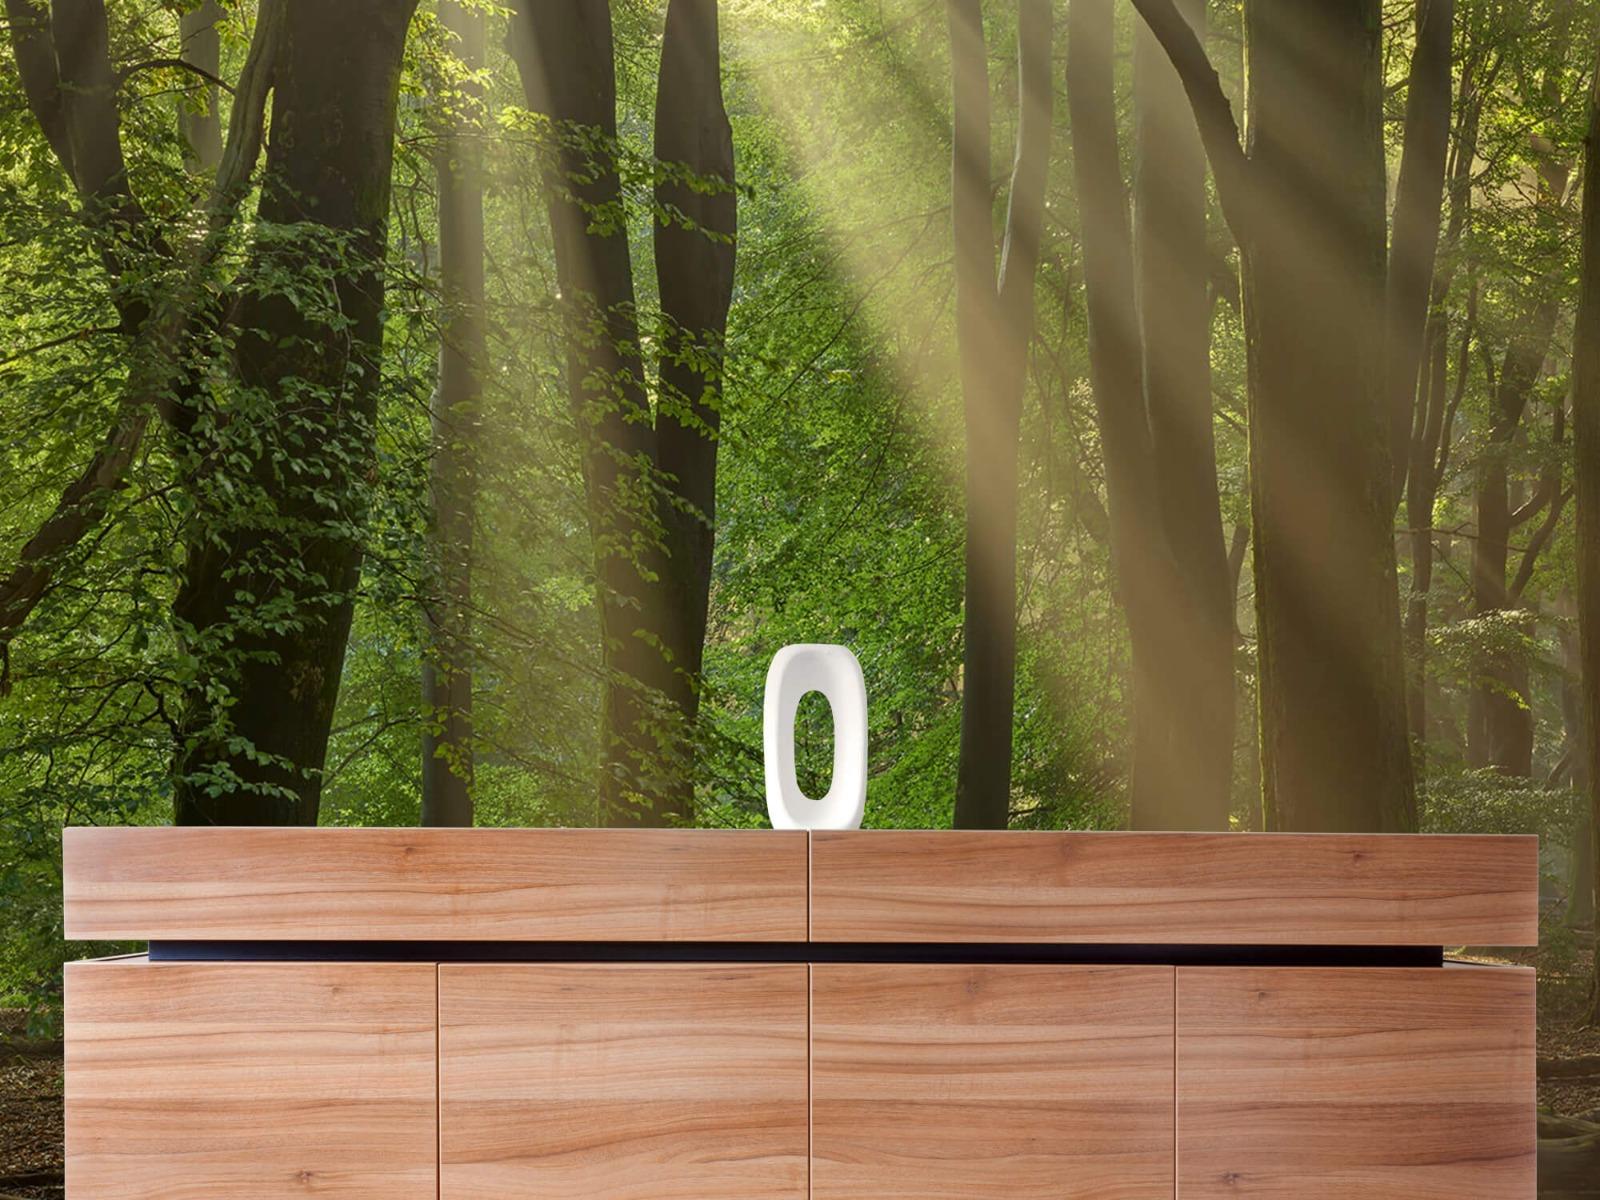 Bomen - Zonneharpen in het bos - Slaapkamer 20